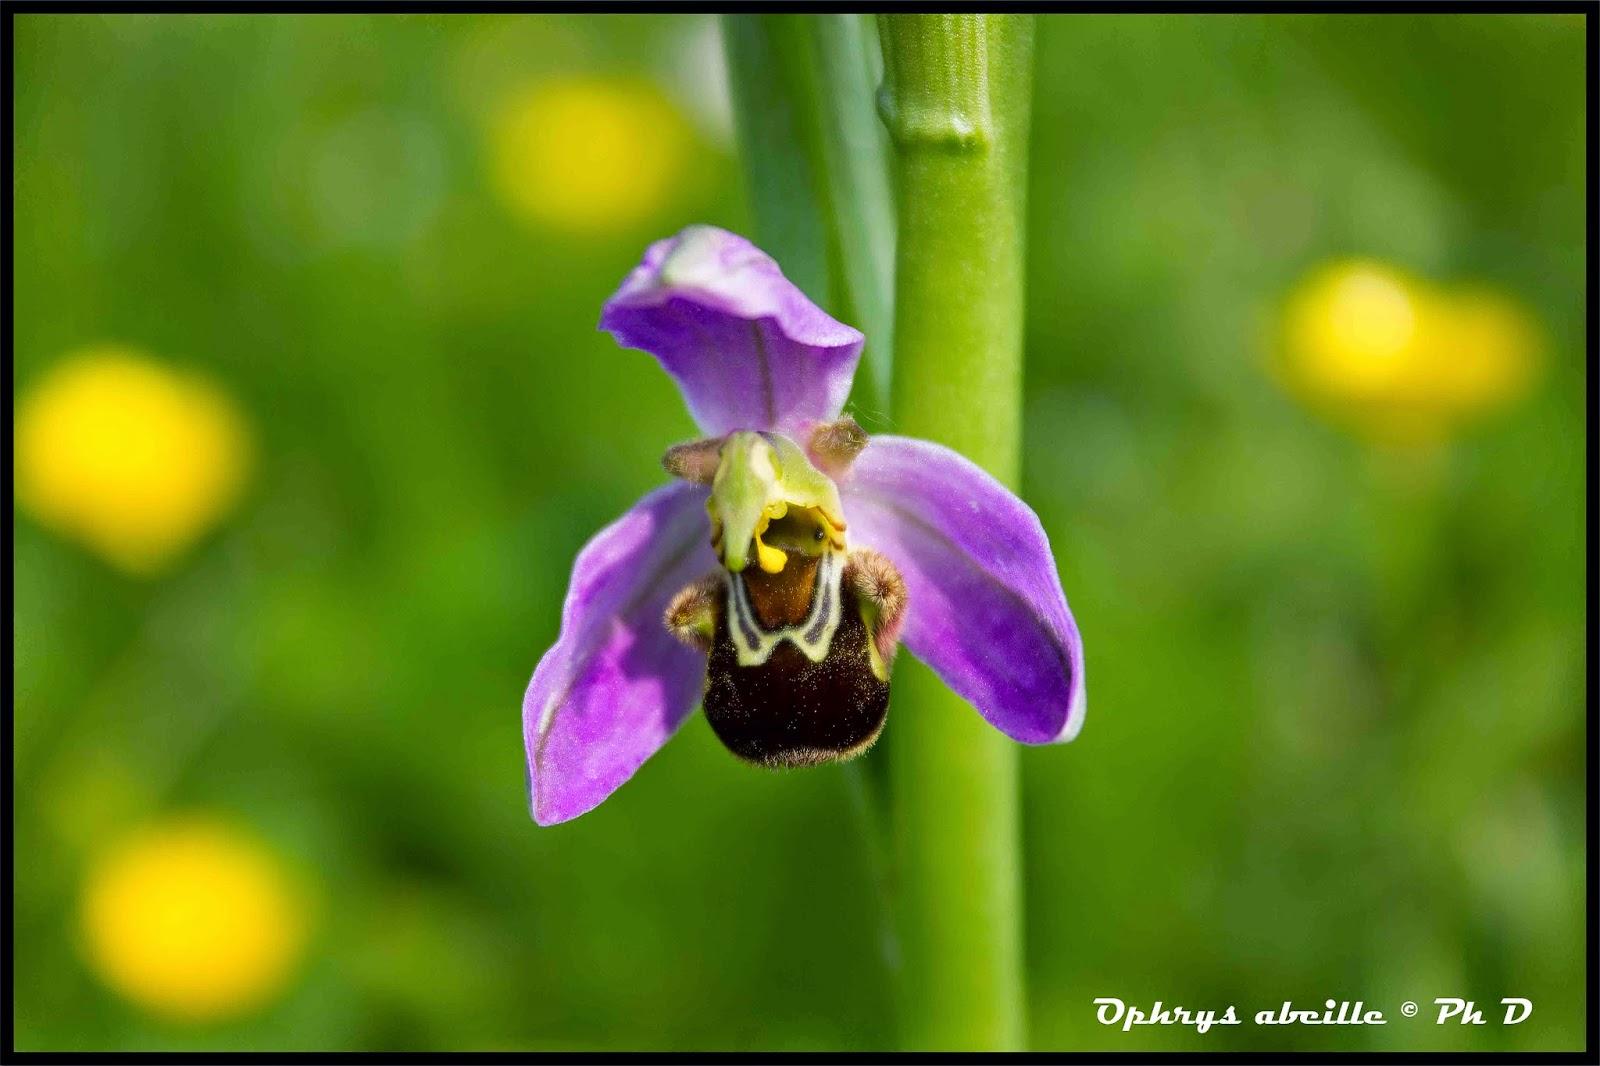 orchidee sauvage espece protegee